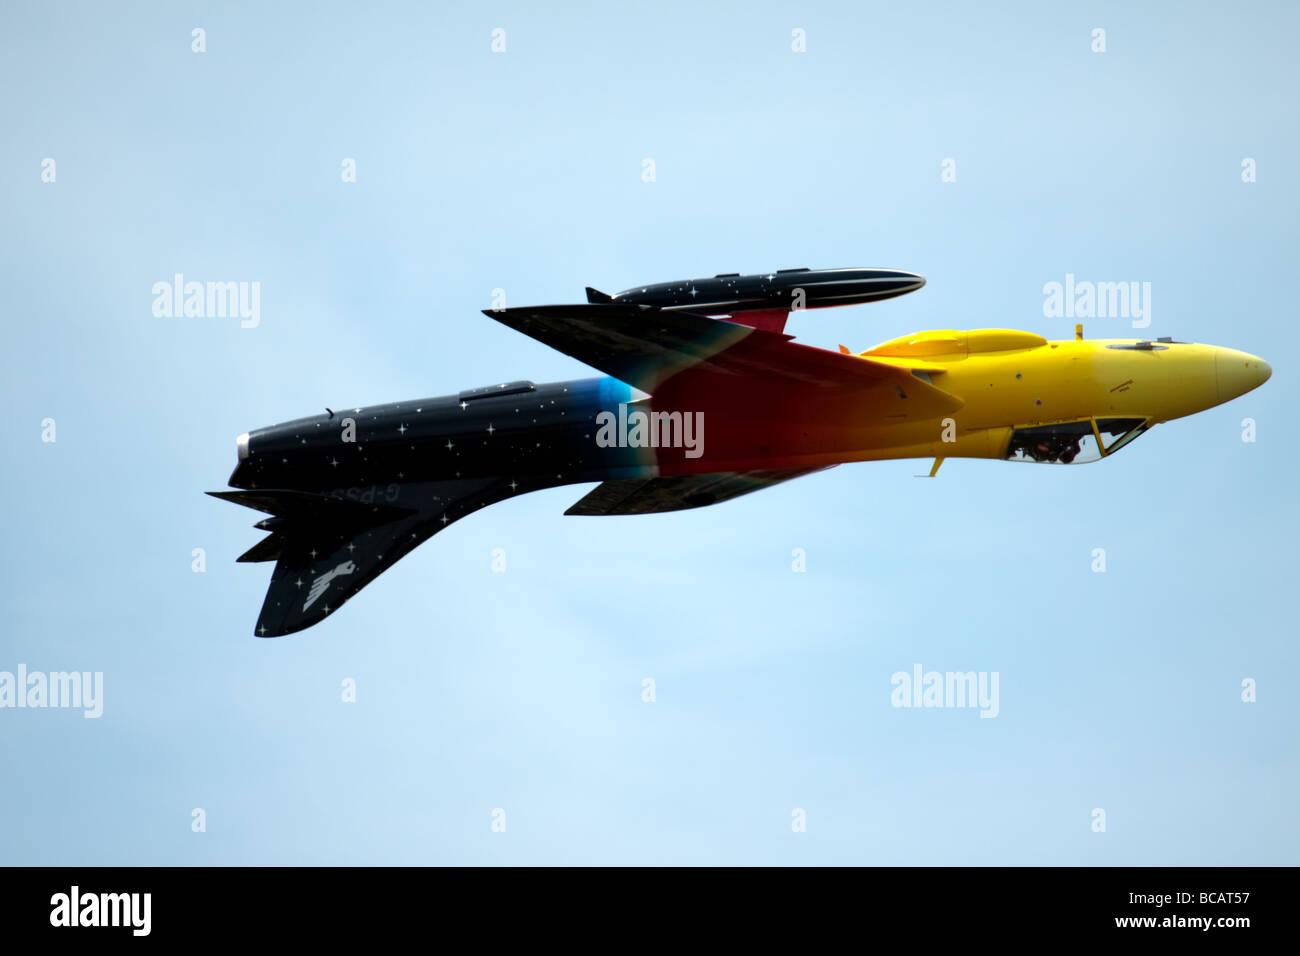 Hawker Hunter Miss Demeanour aerial display at Biggin Hill Airshow Stock Photo